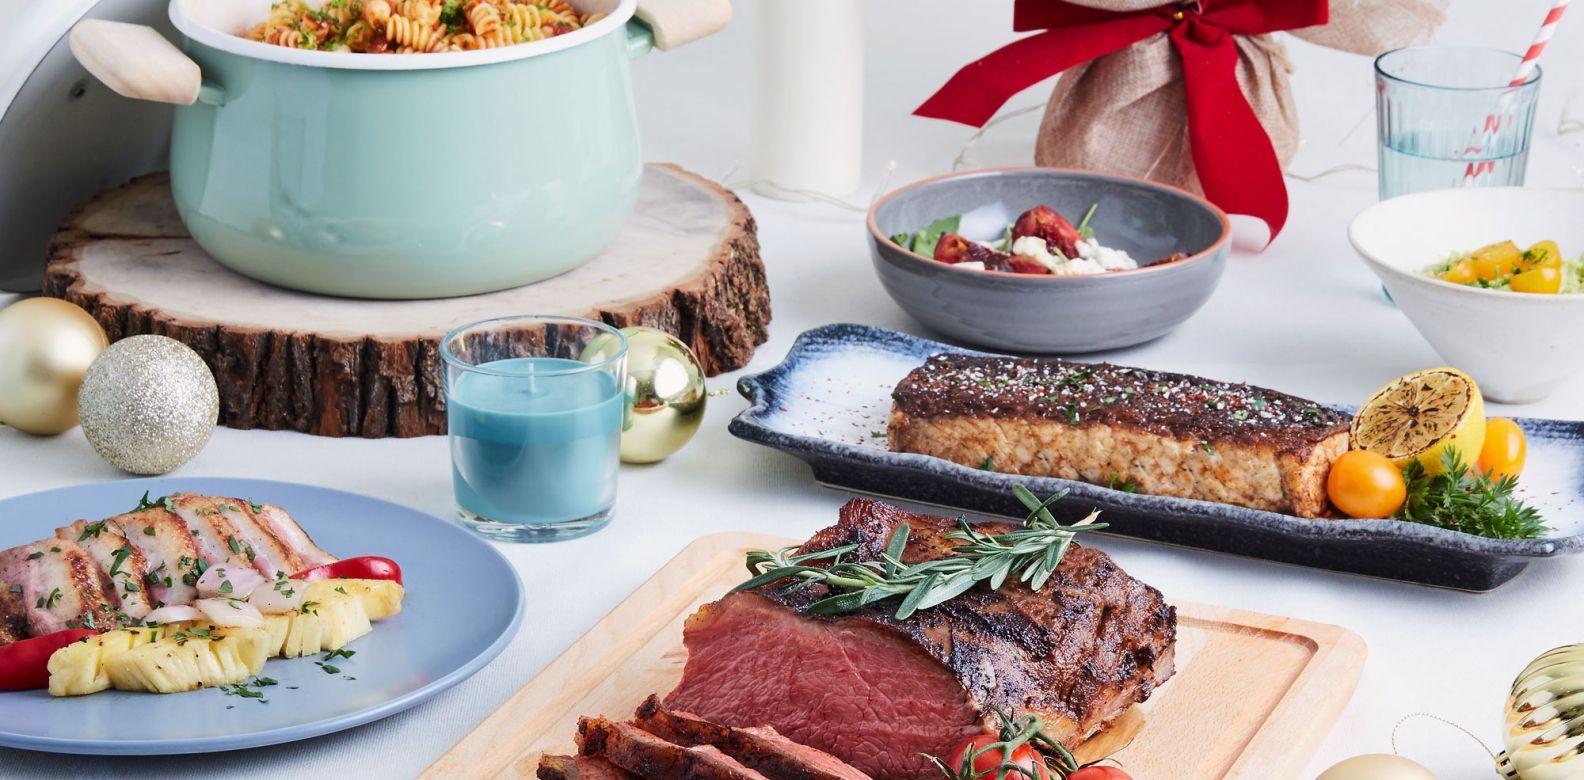 The Festive Set C comes with this gorgeous 1.3 sirloin steak